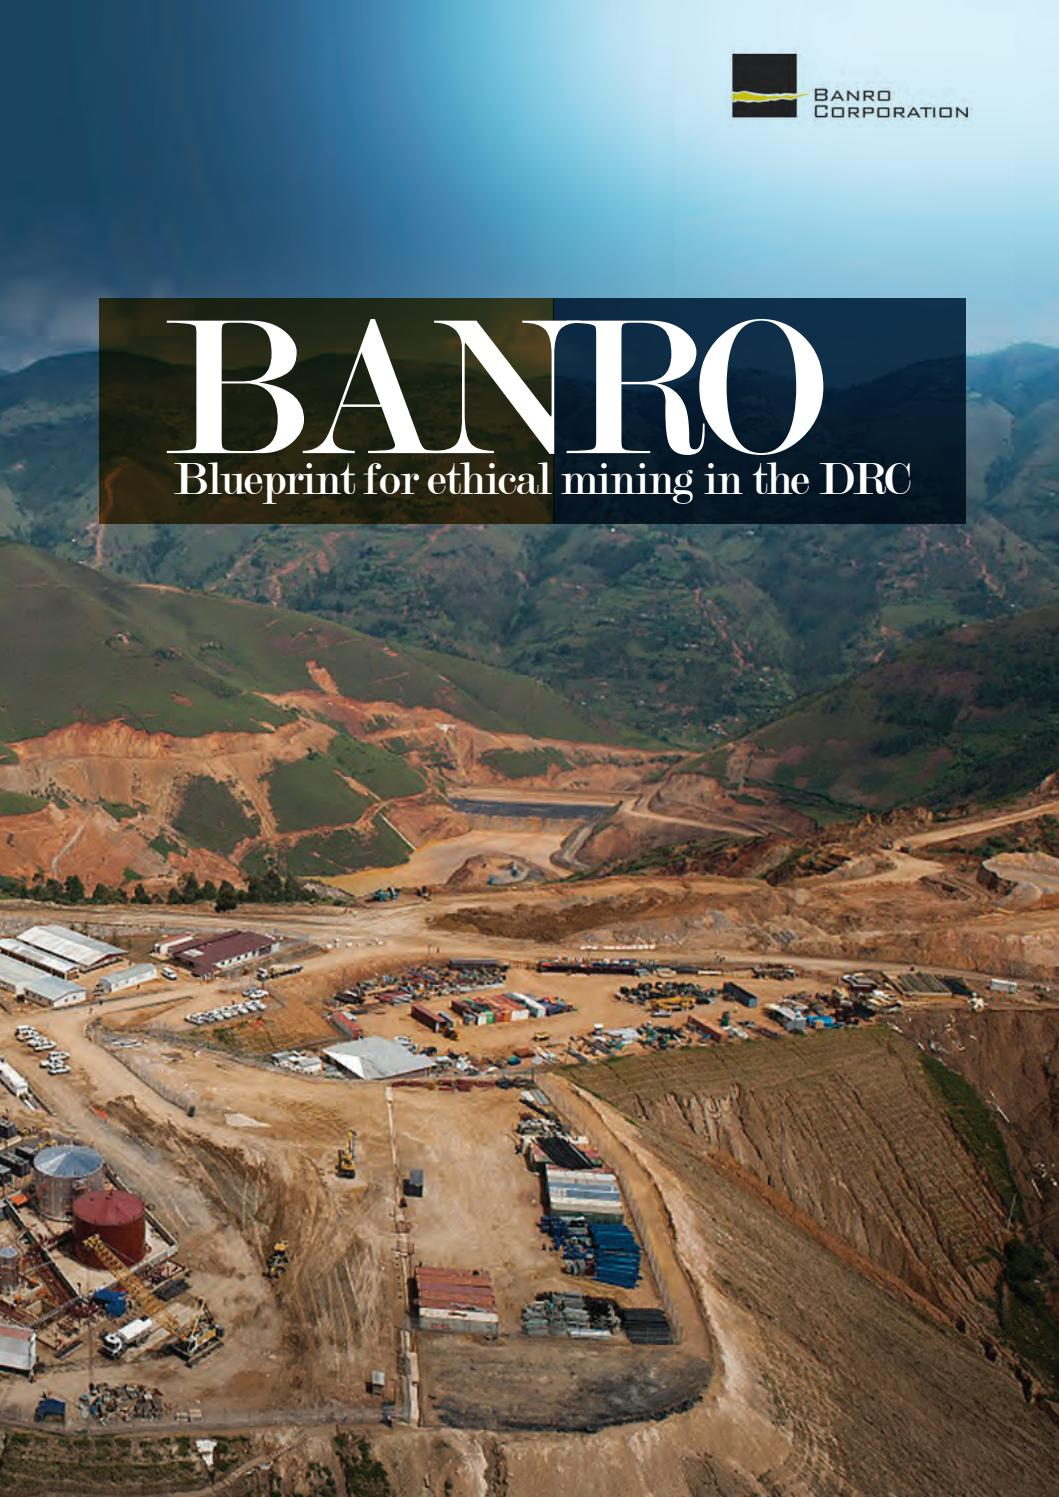 Banro